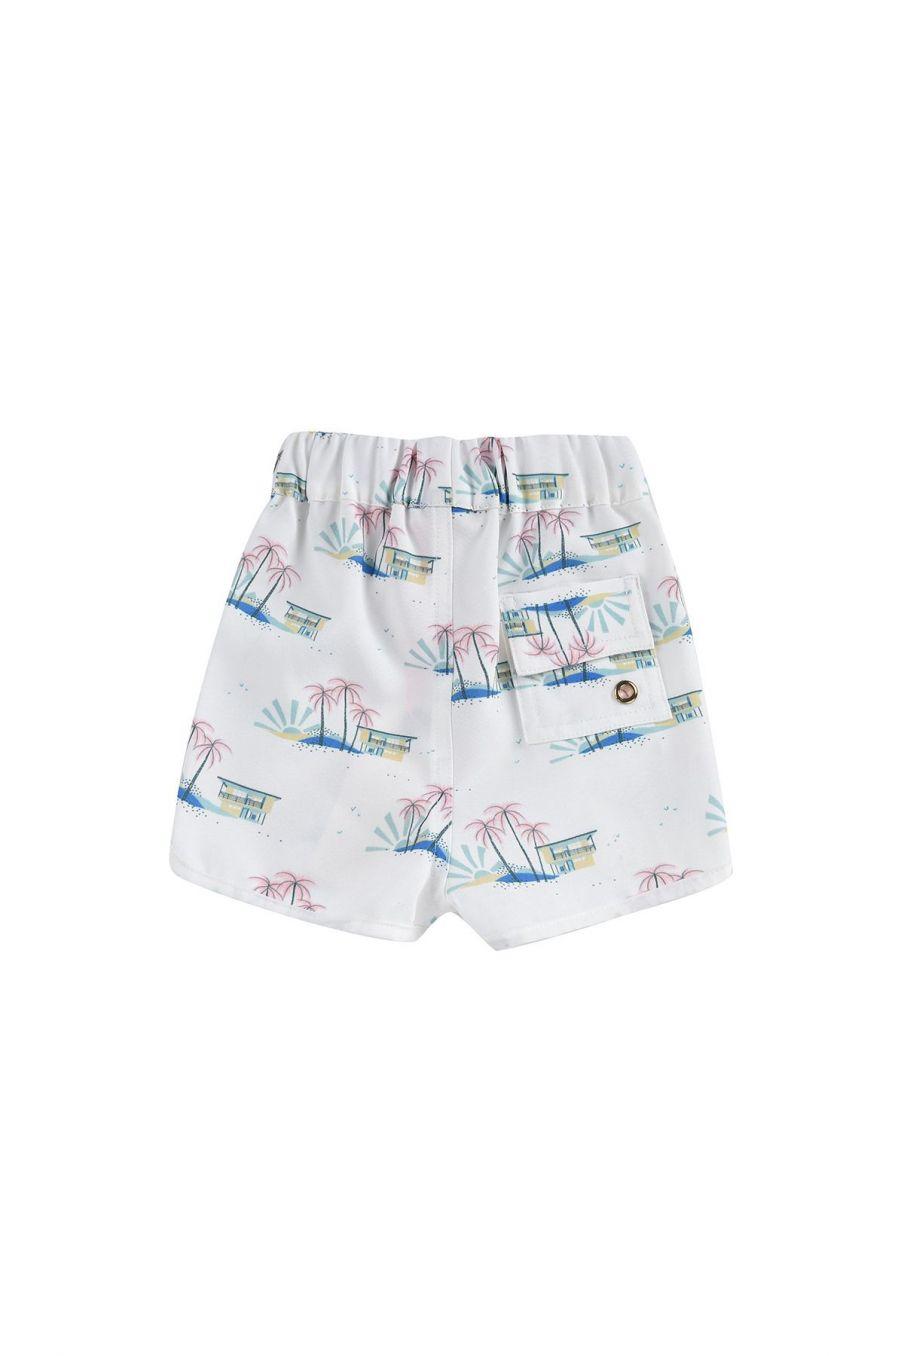 boheme chic vintage short de bain bébé garcon aderi off-white hawaï